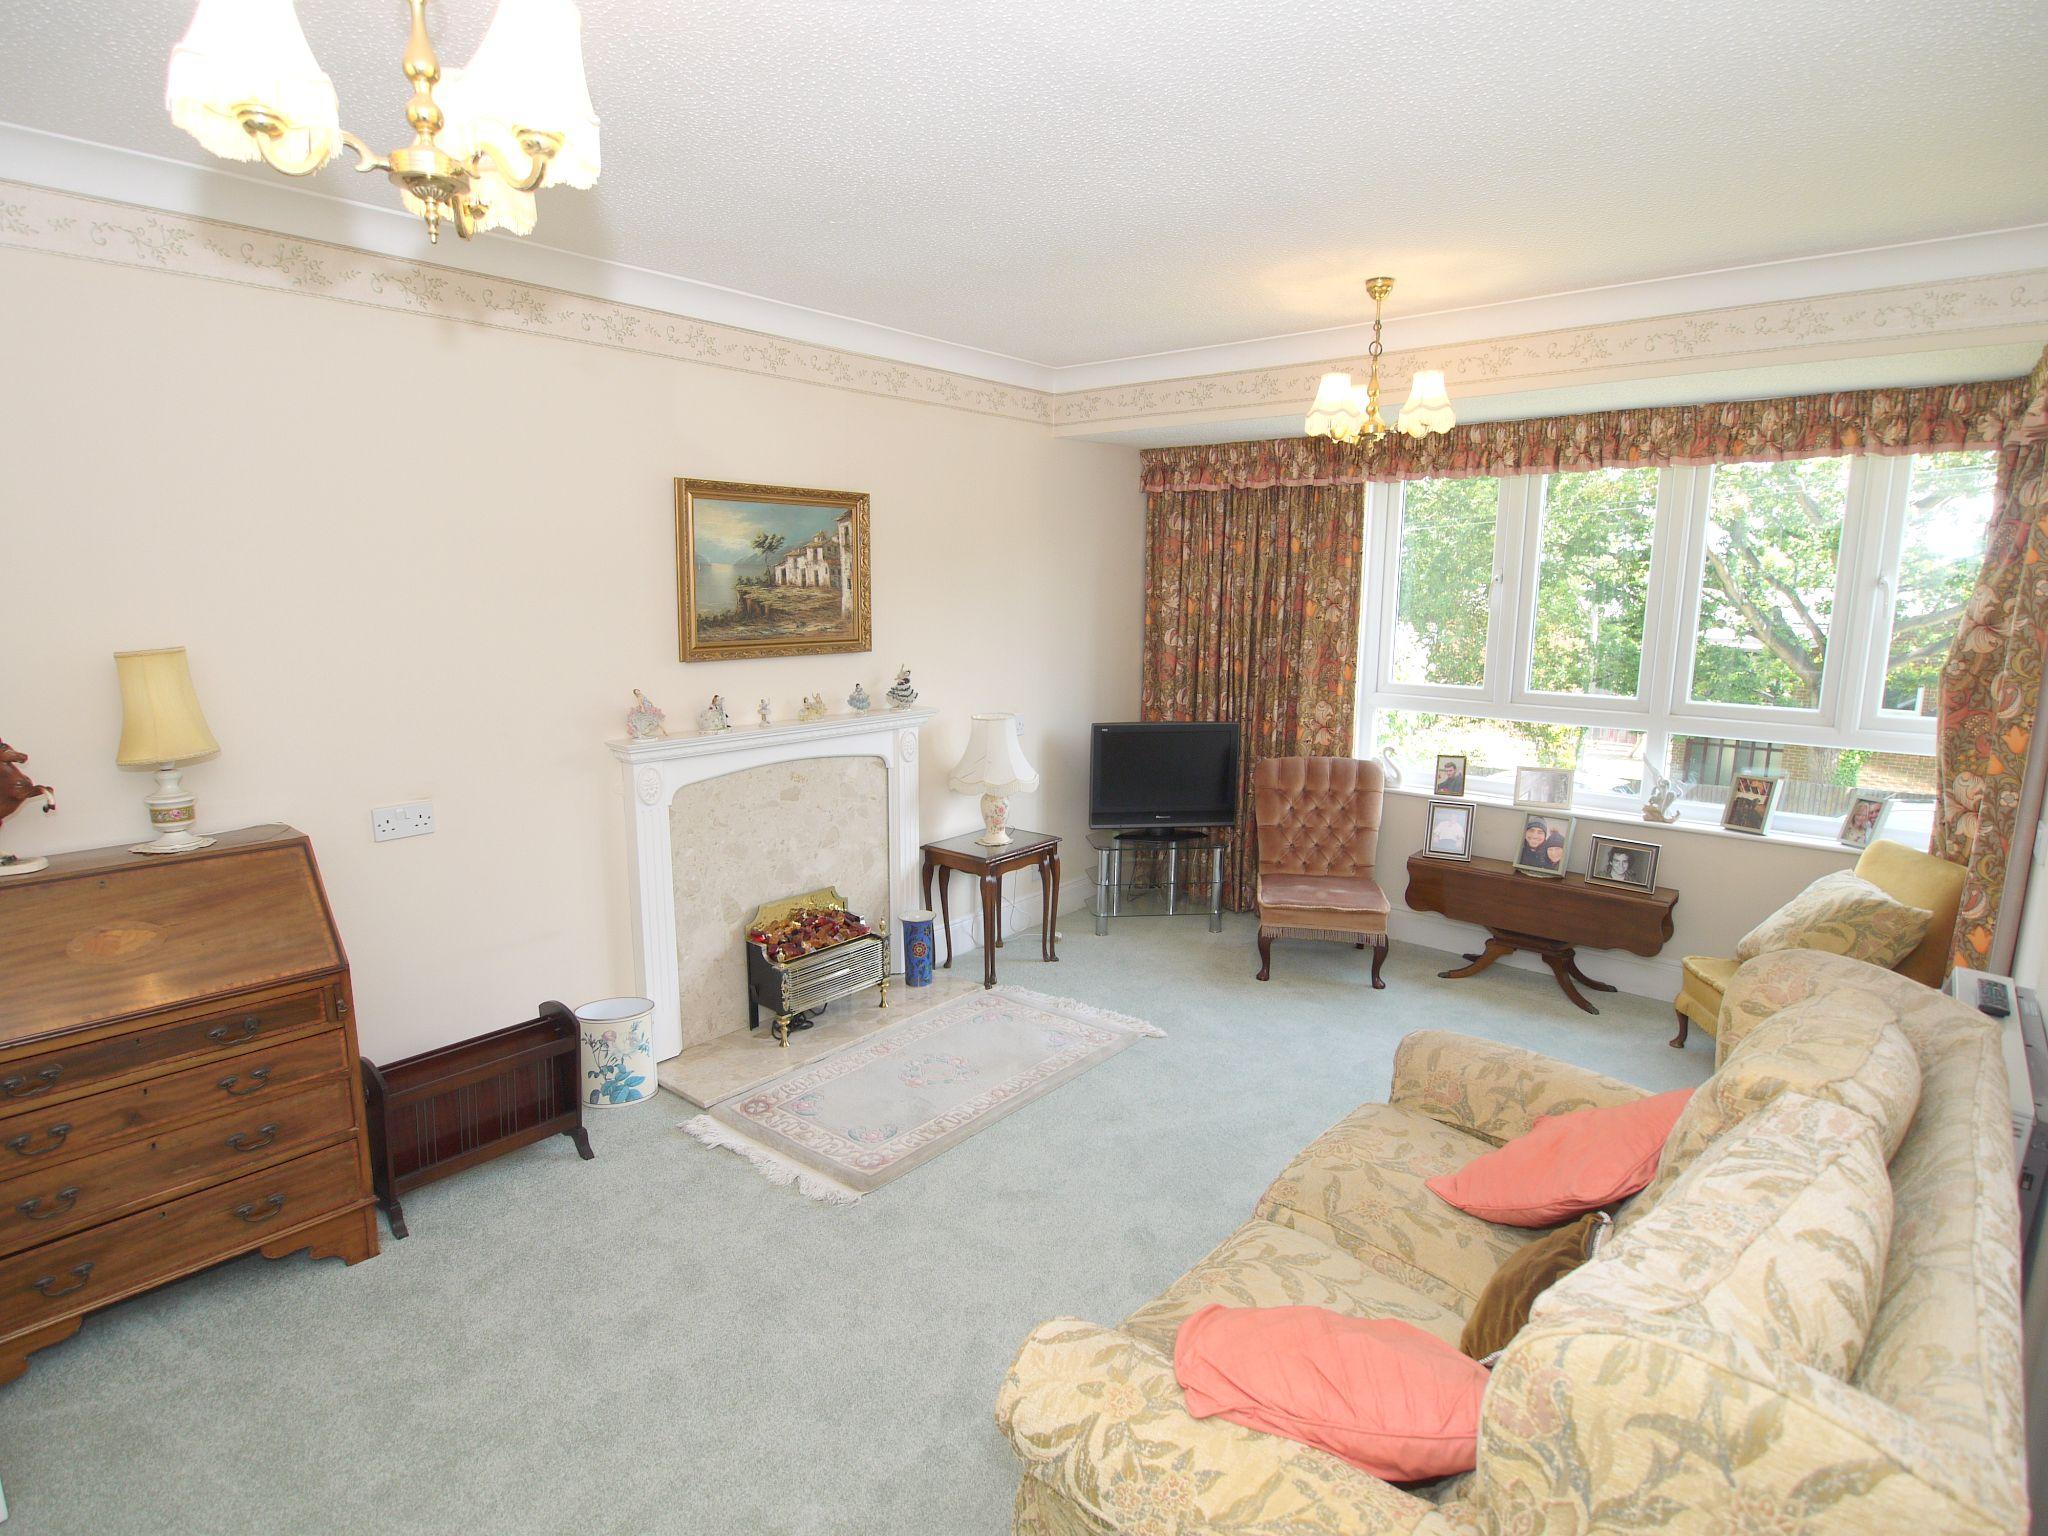 2 bedroom apartment For Sale in Sevenoaks - Photograph 2